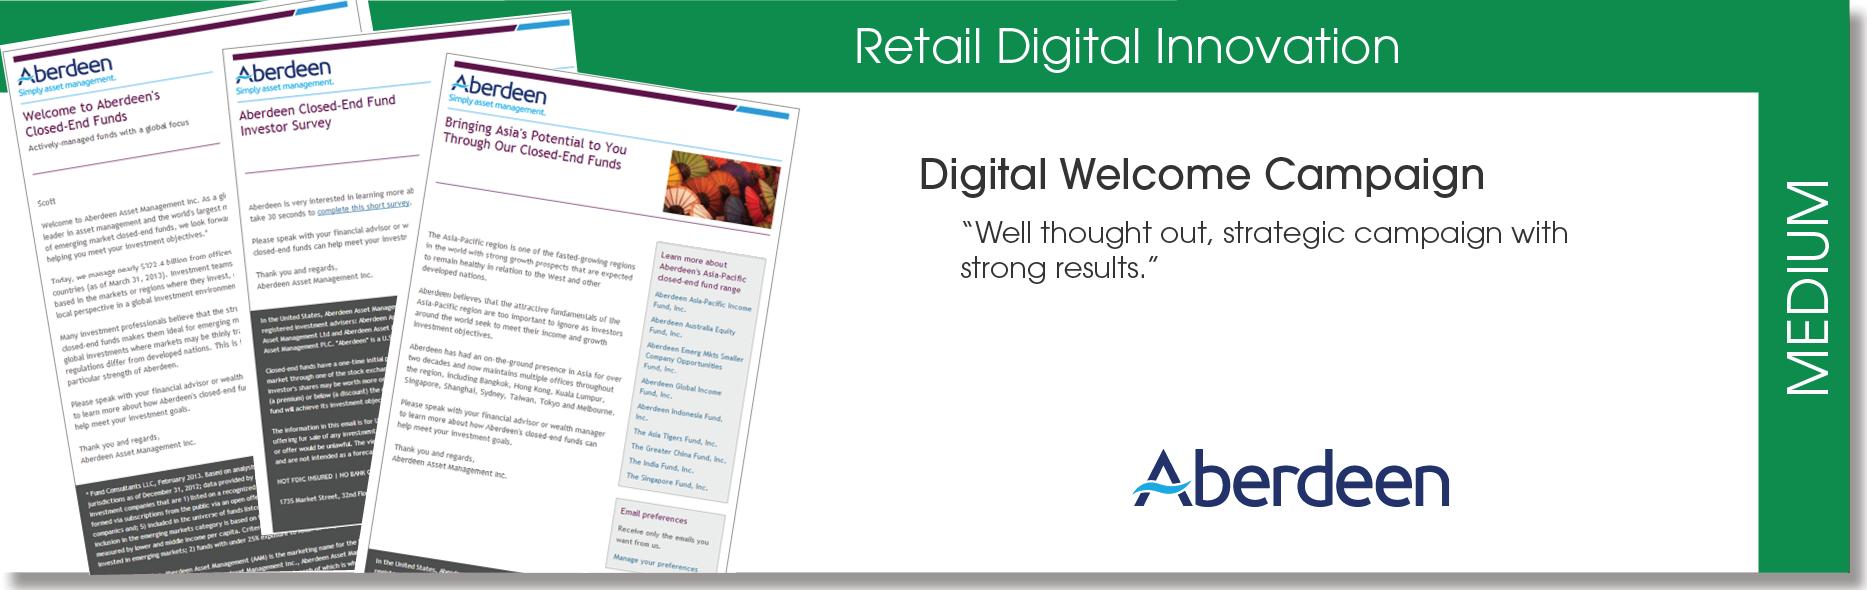 Medium Retail Winner Image11